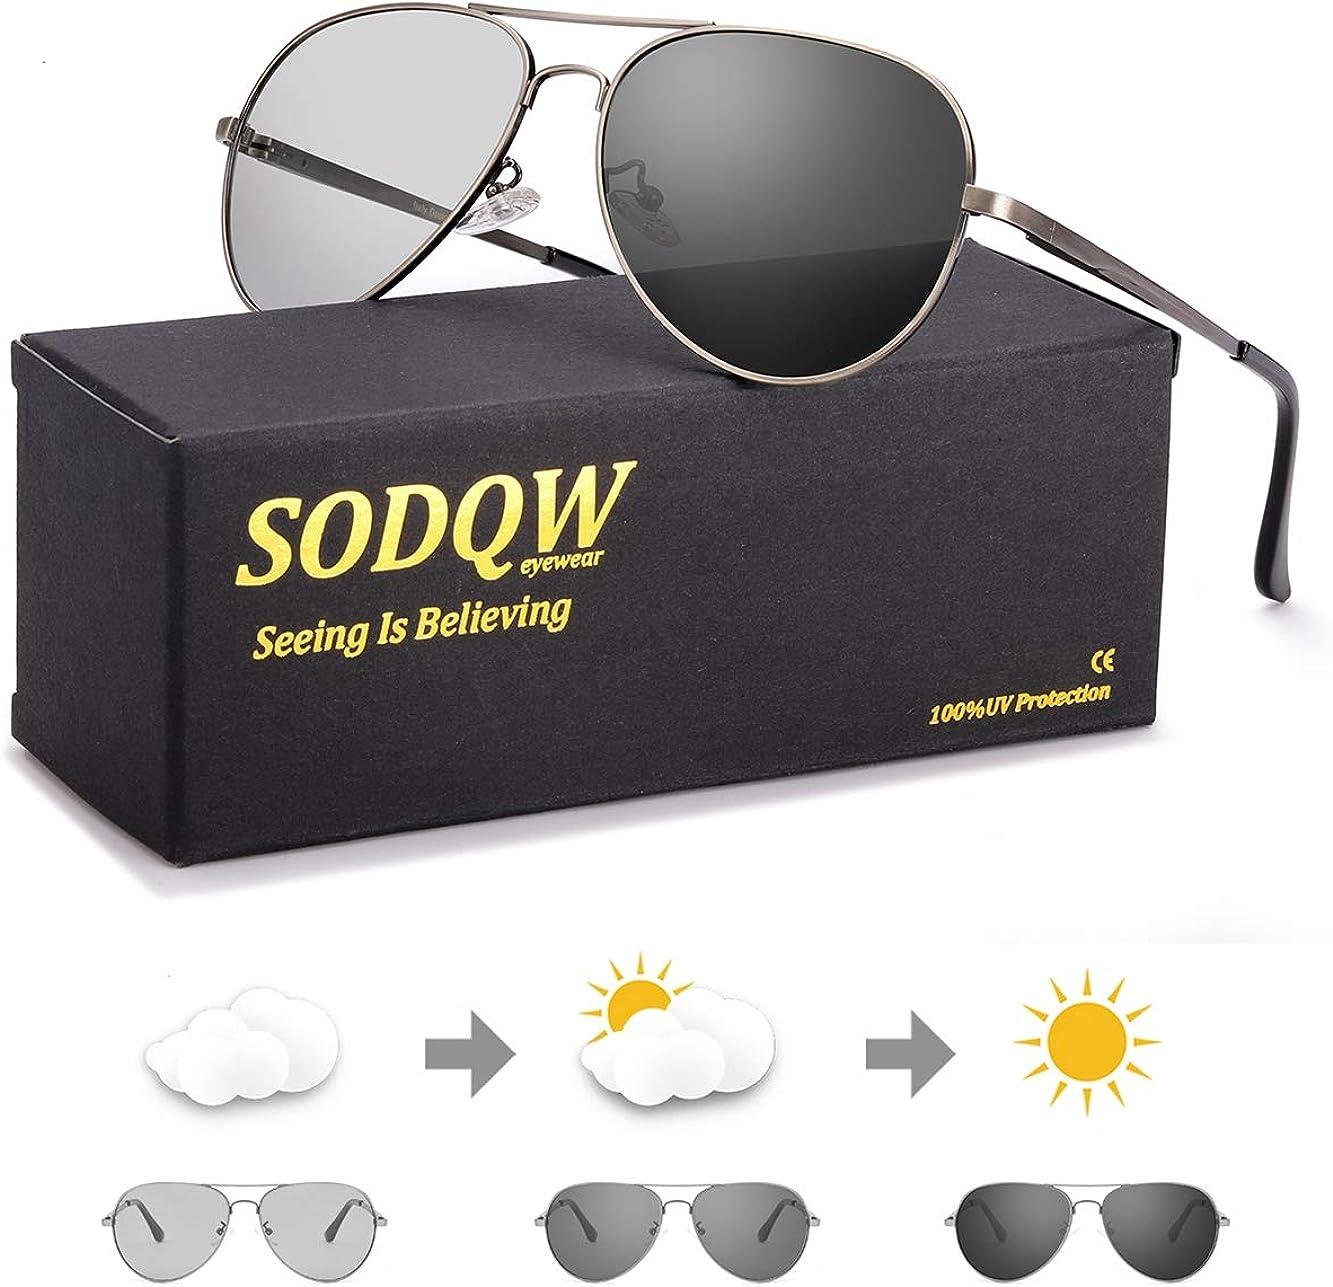 SODQW gafas de sol fotocromaticas polarizadas hombre 100% UVA/UVB Protección